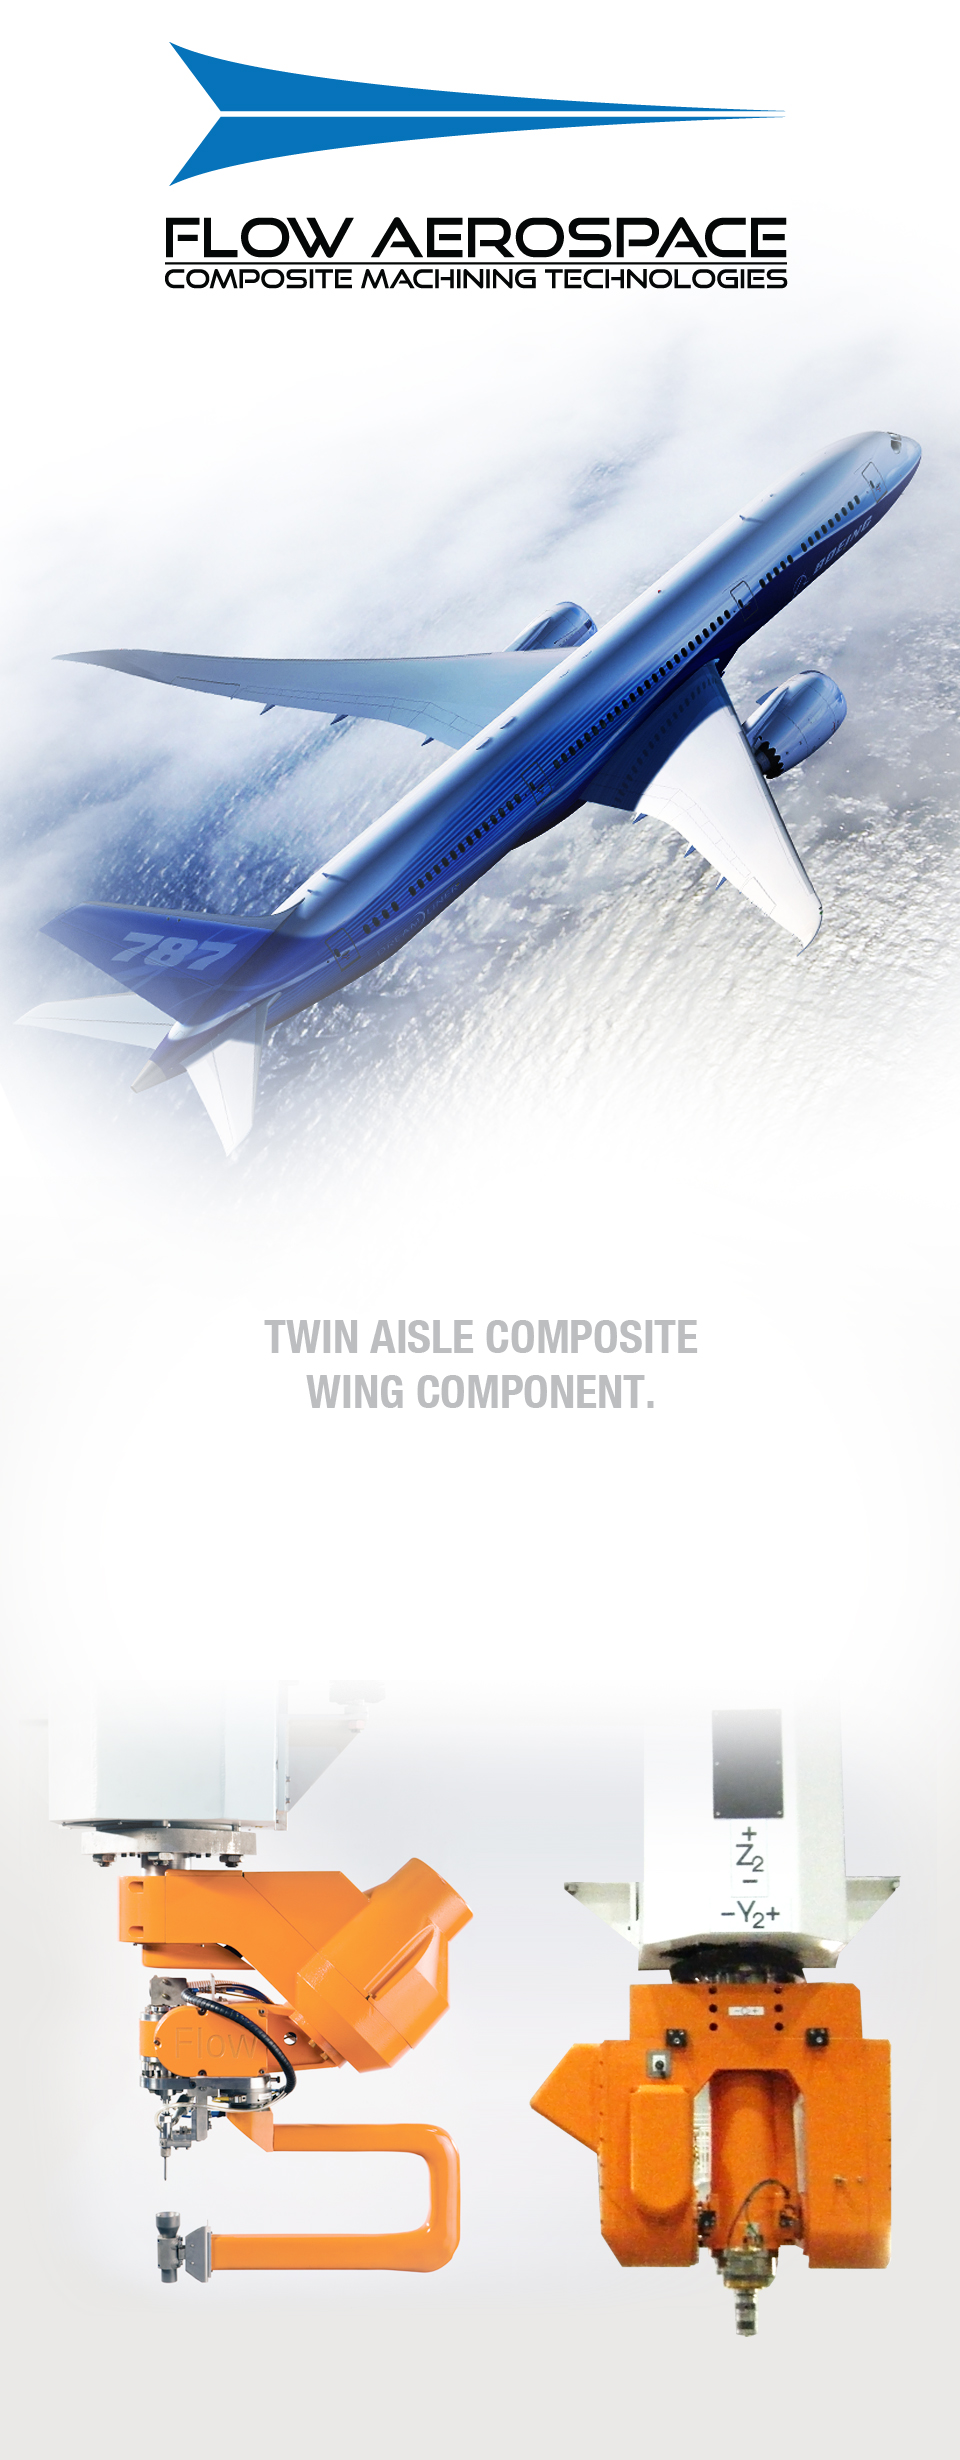 flowaerospaceV1